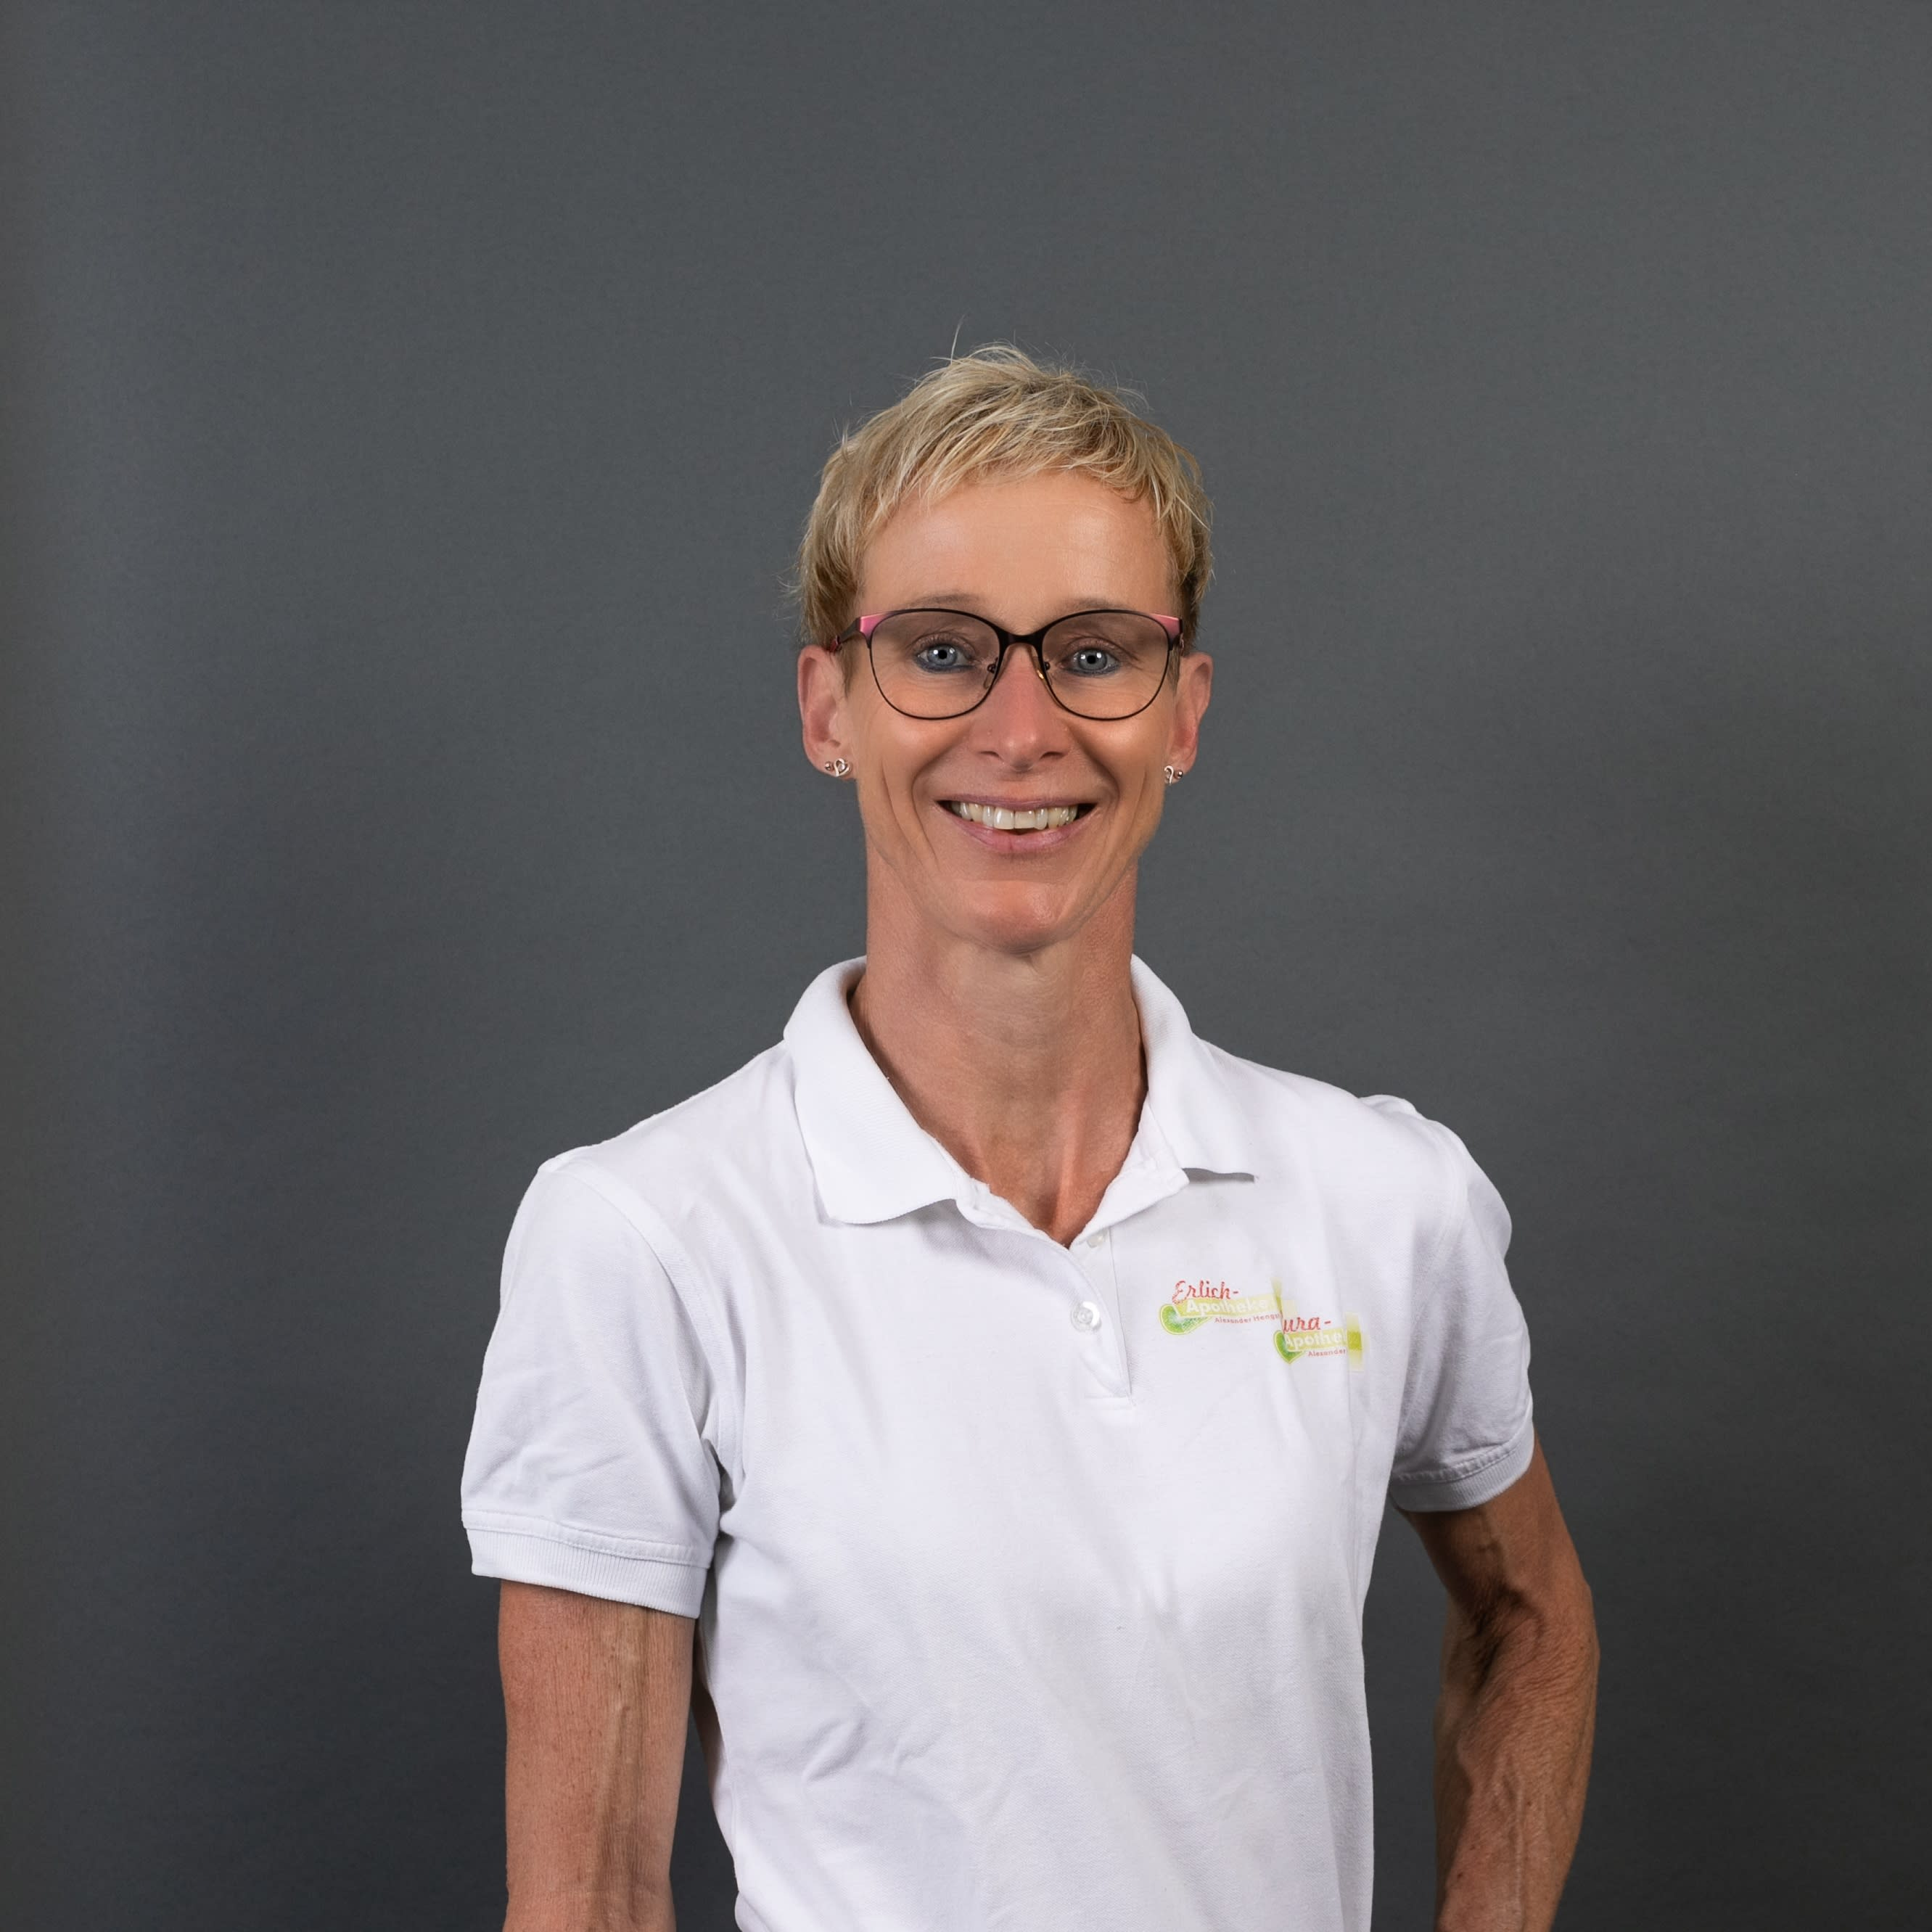 Frau Helmig Apotheke Speyer